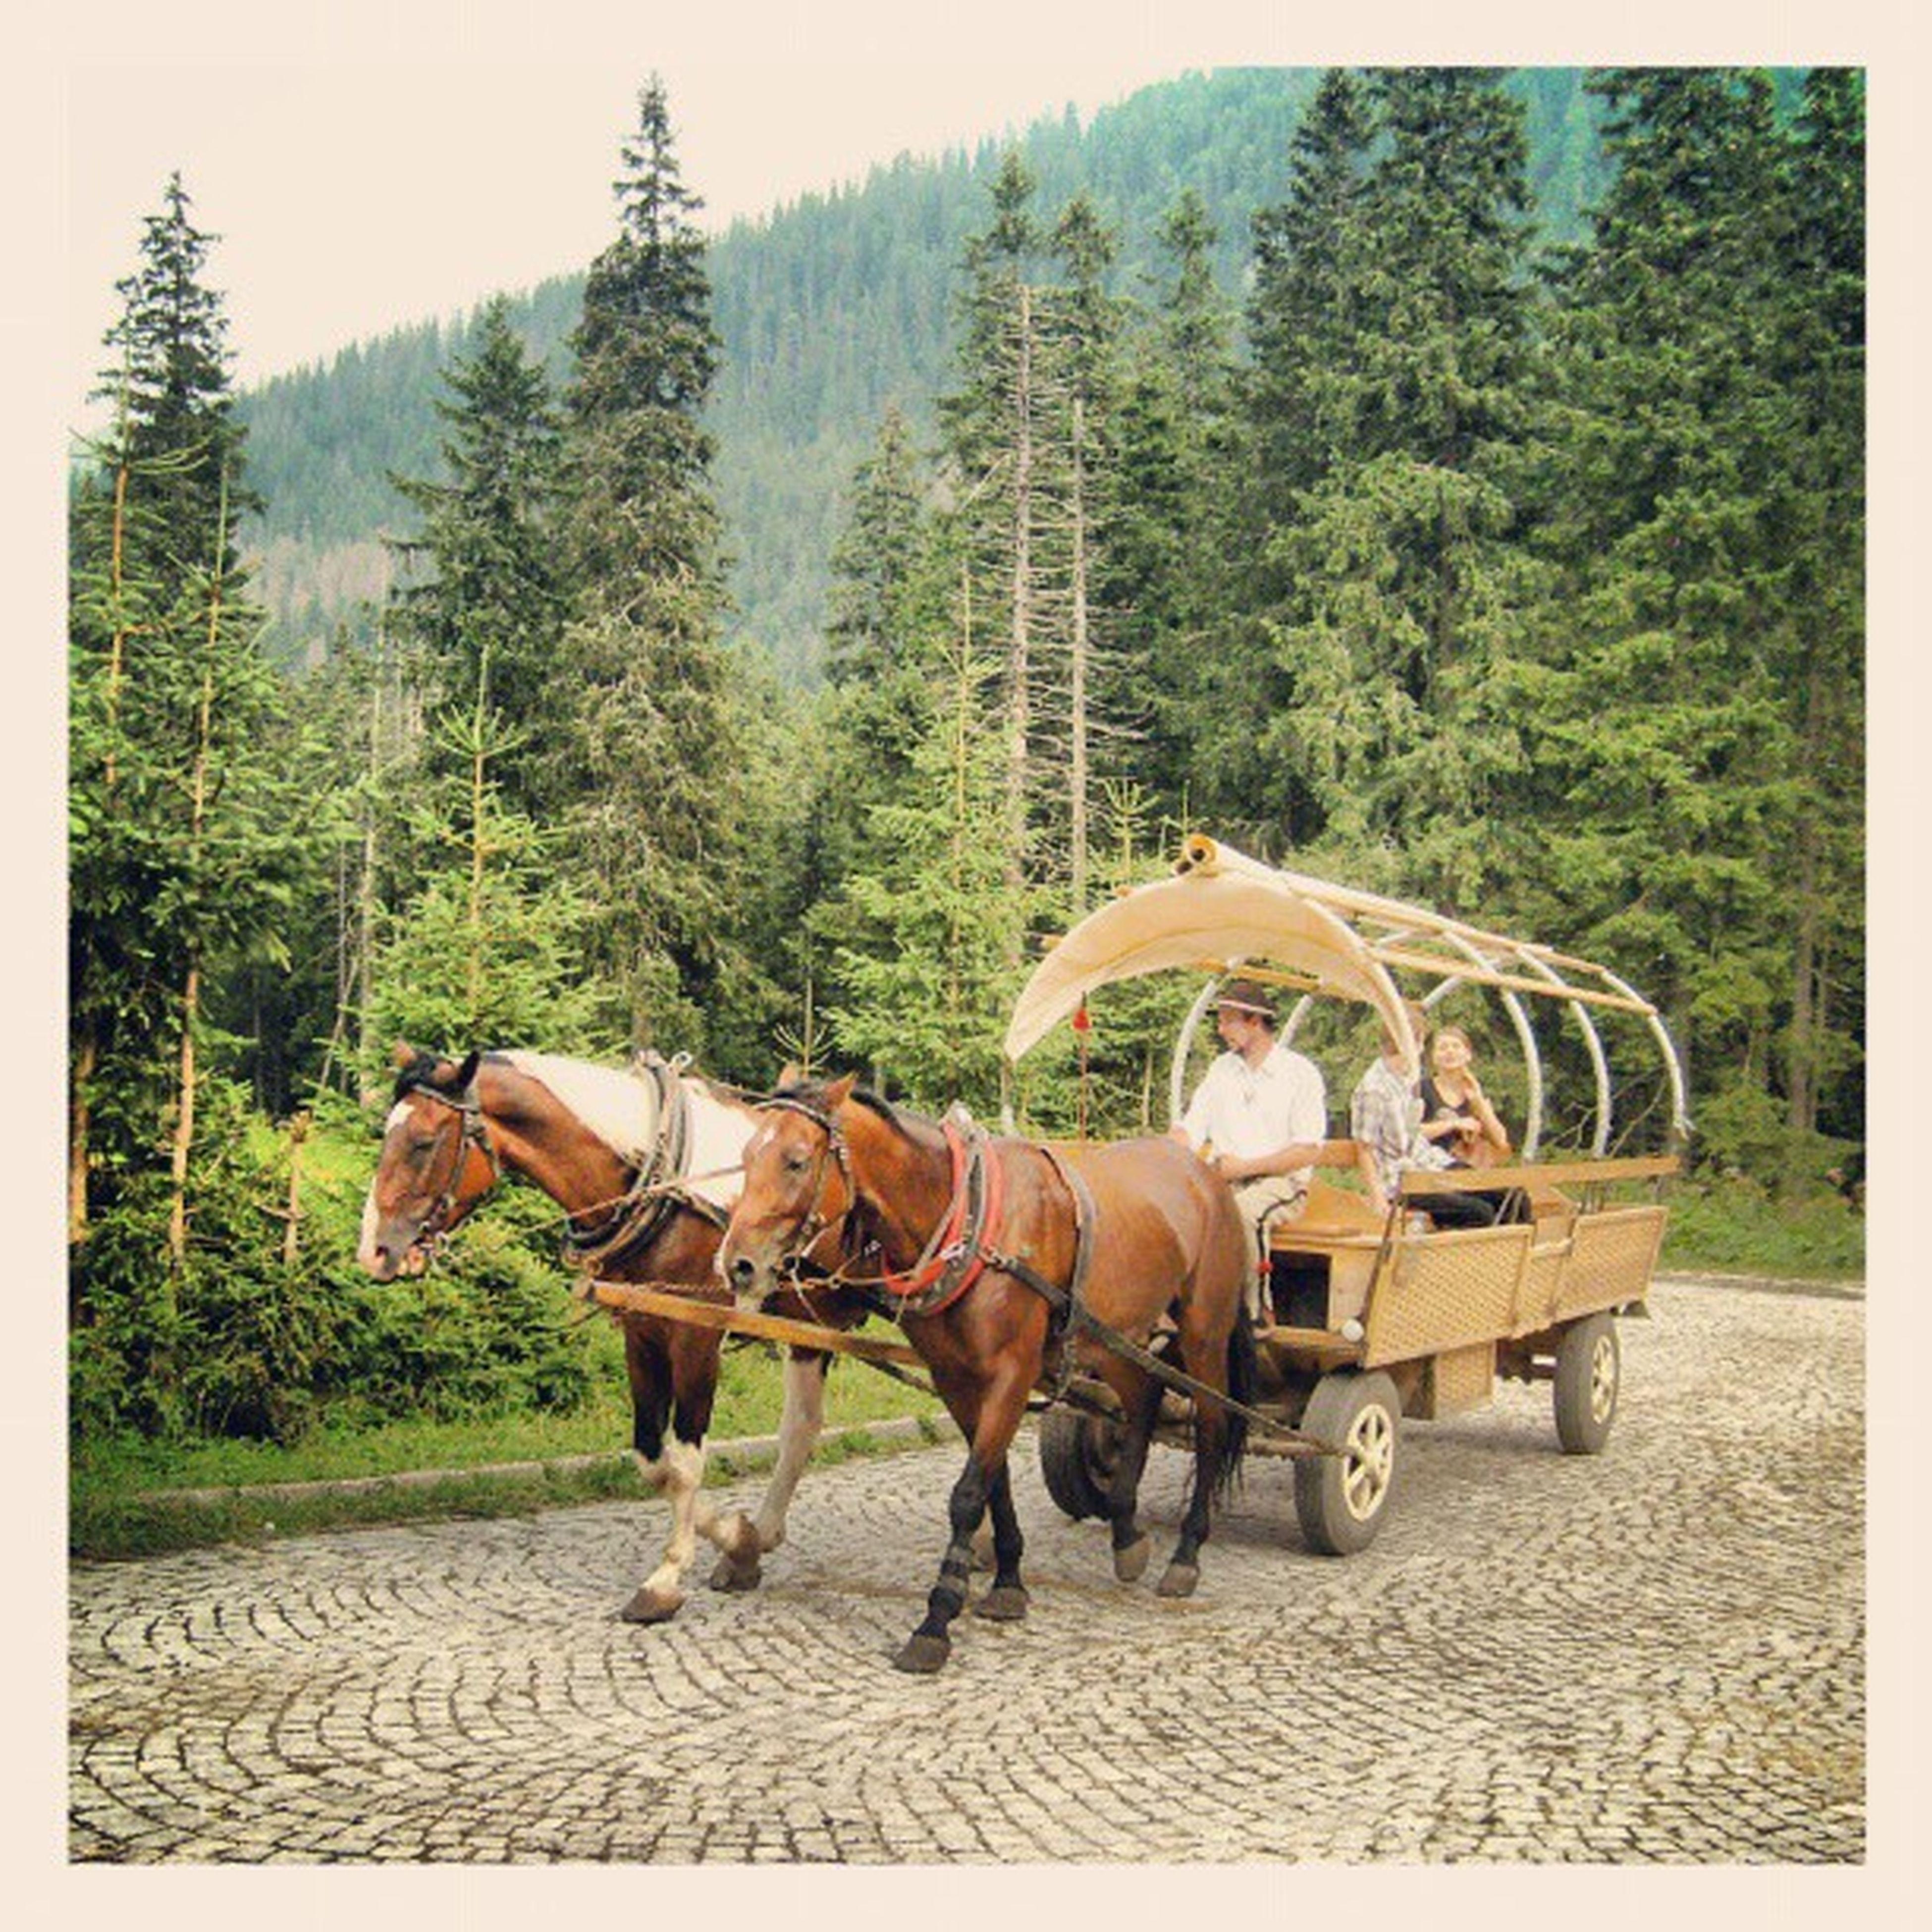 horse, tree, transportation, working animal, mode of transport, men, domestic animals, land vehicle, lifestyles, full length, riding, mammal, leisure activity, animal themes, livestock, day, horse cart, person